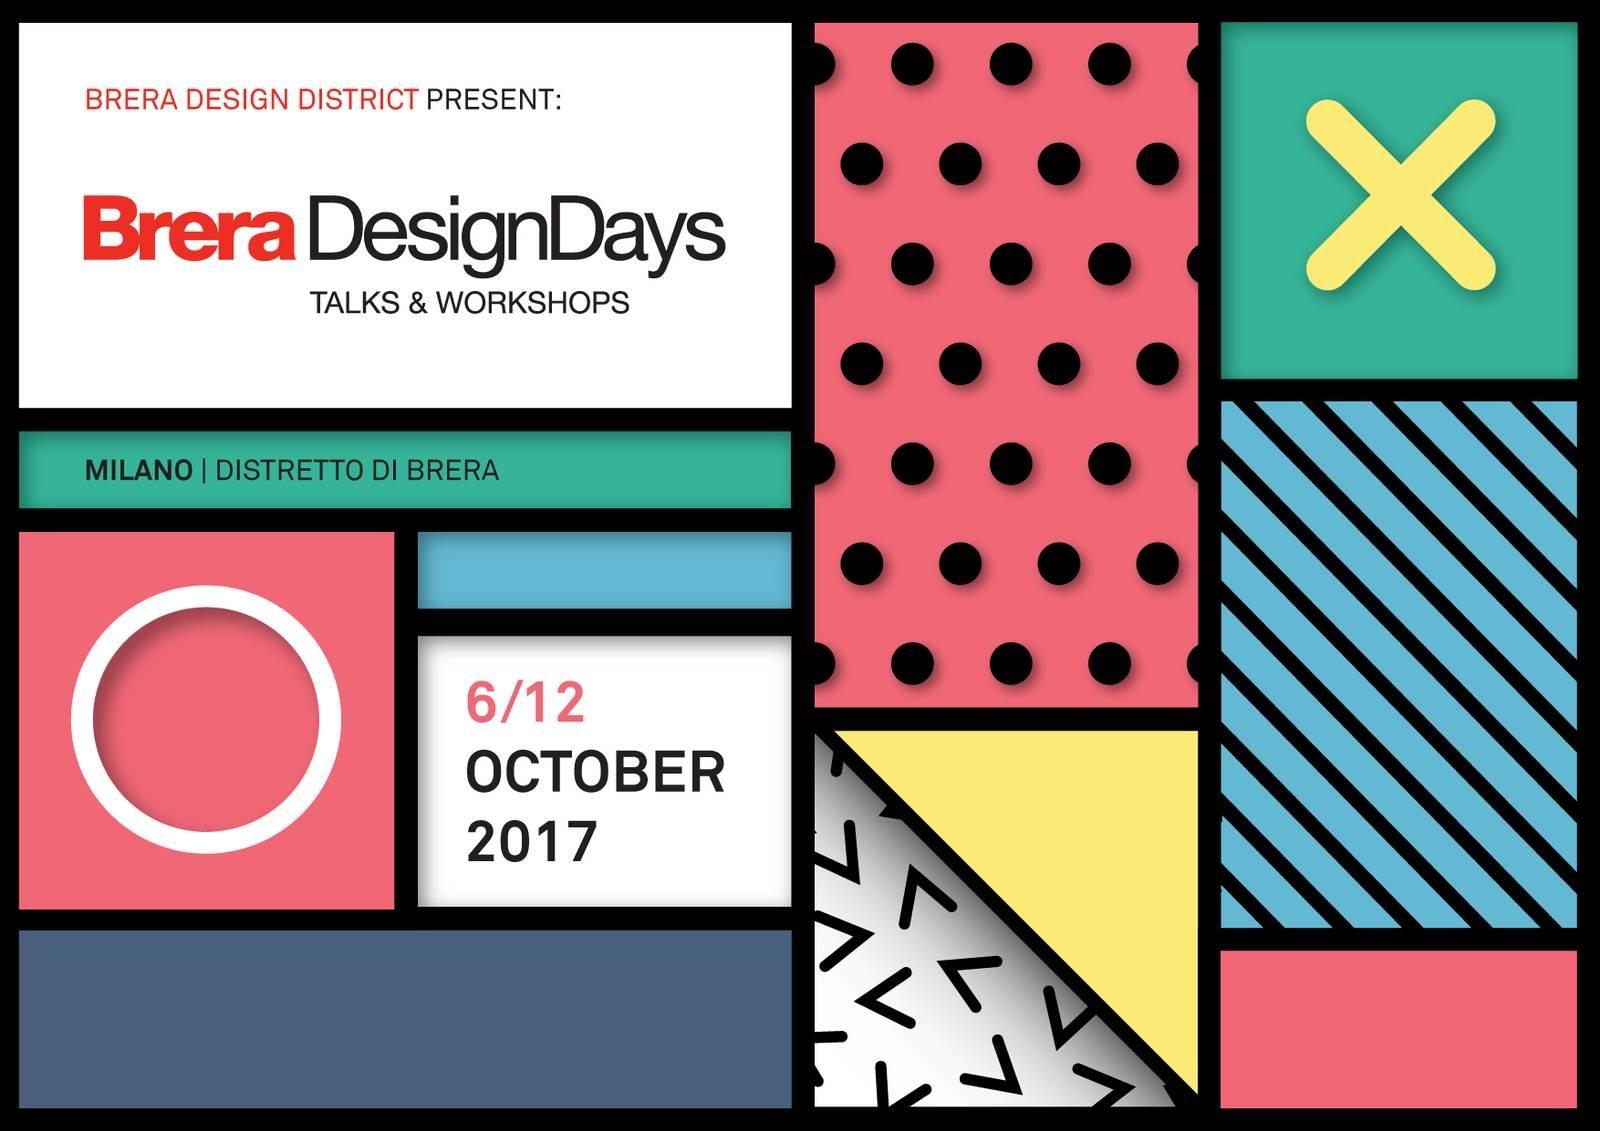 brera design days logo cose di casa